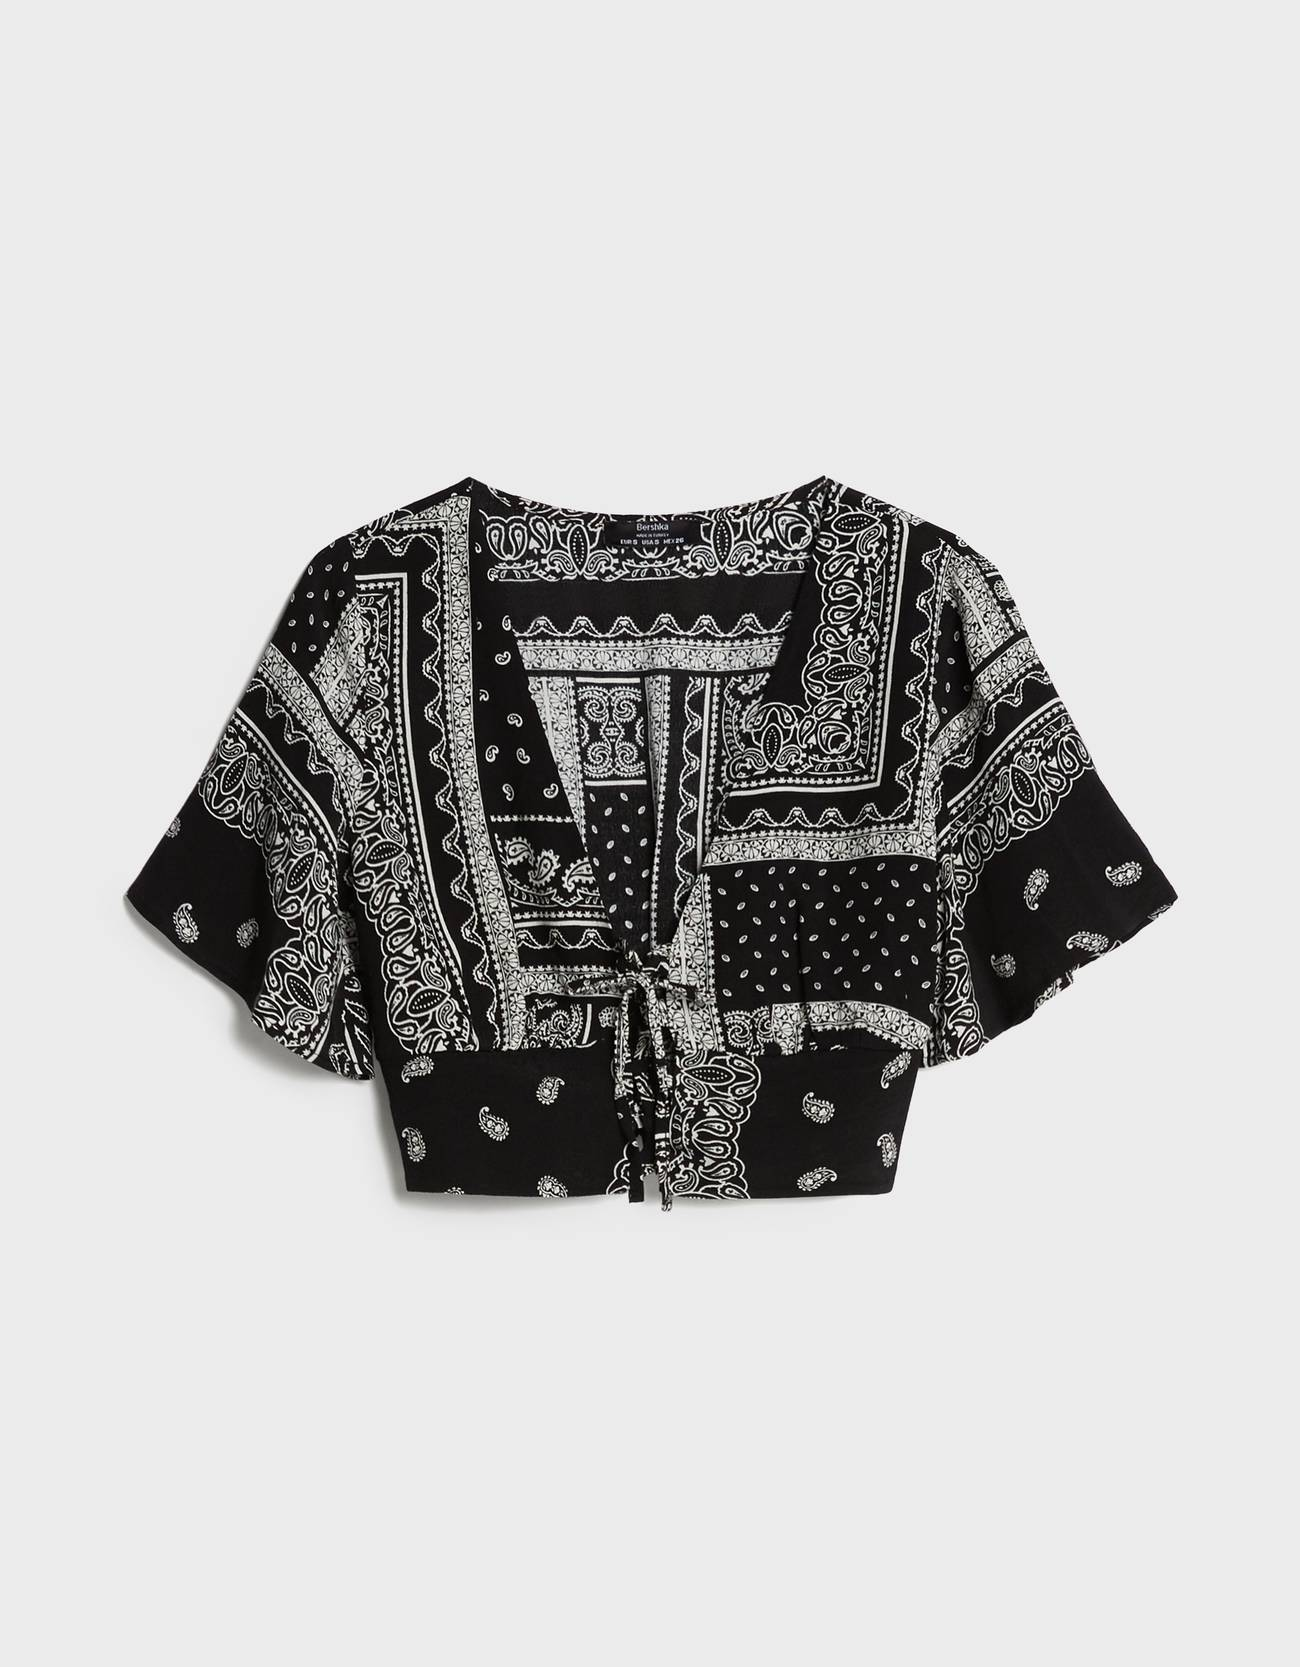 Blusa tipo cropped de color negro.